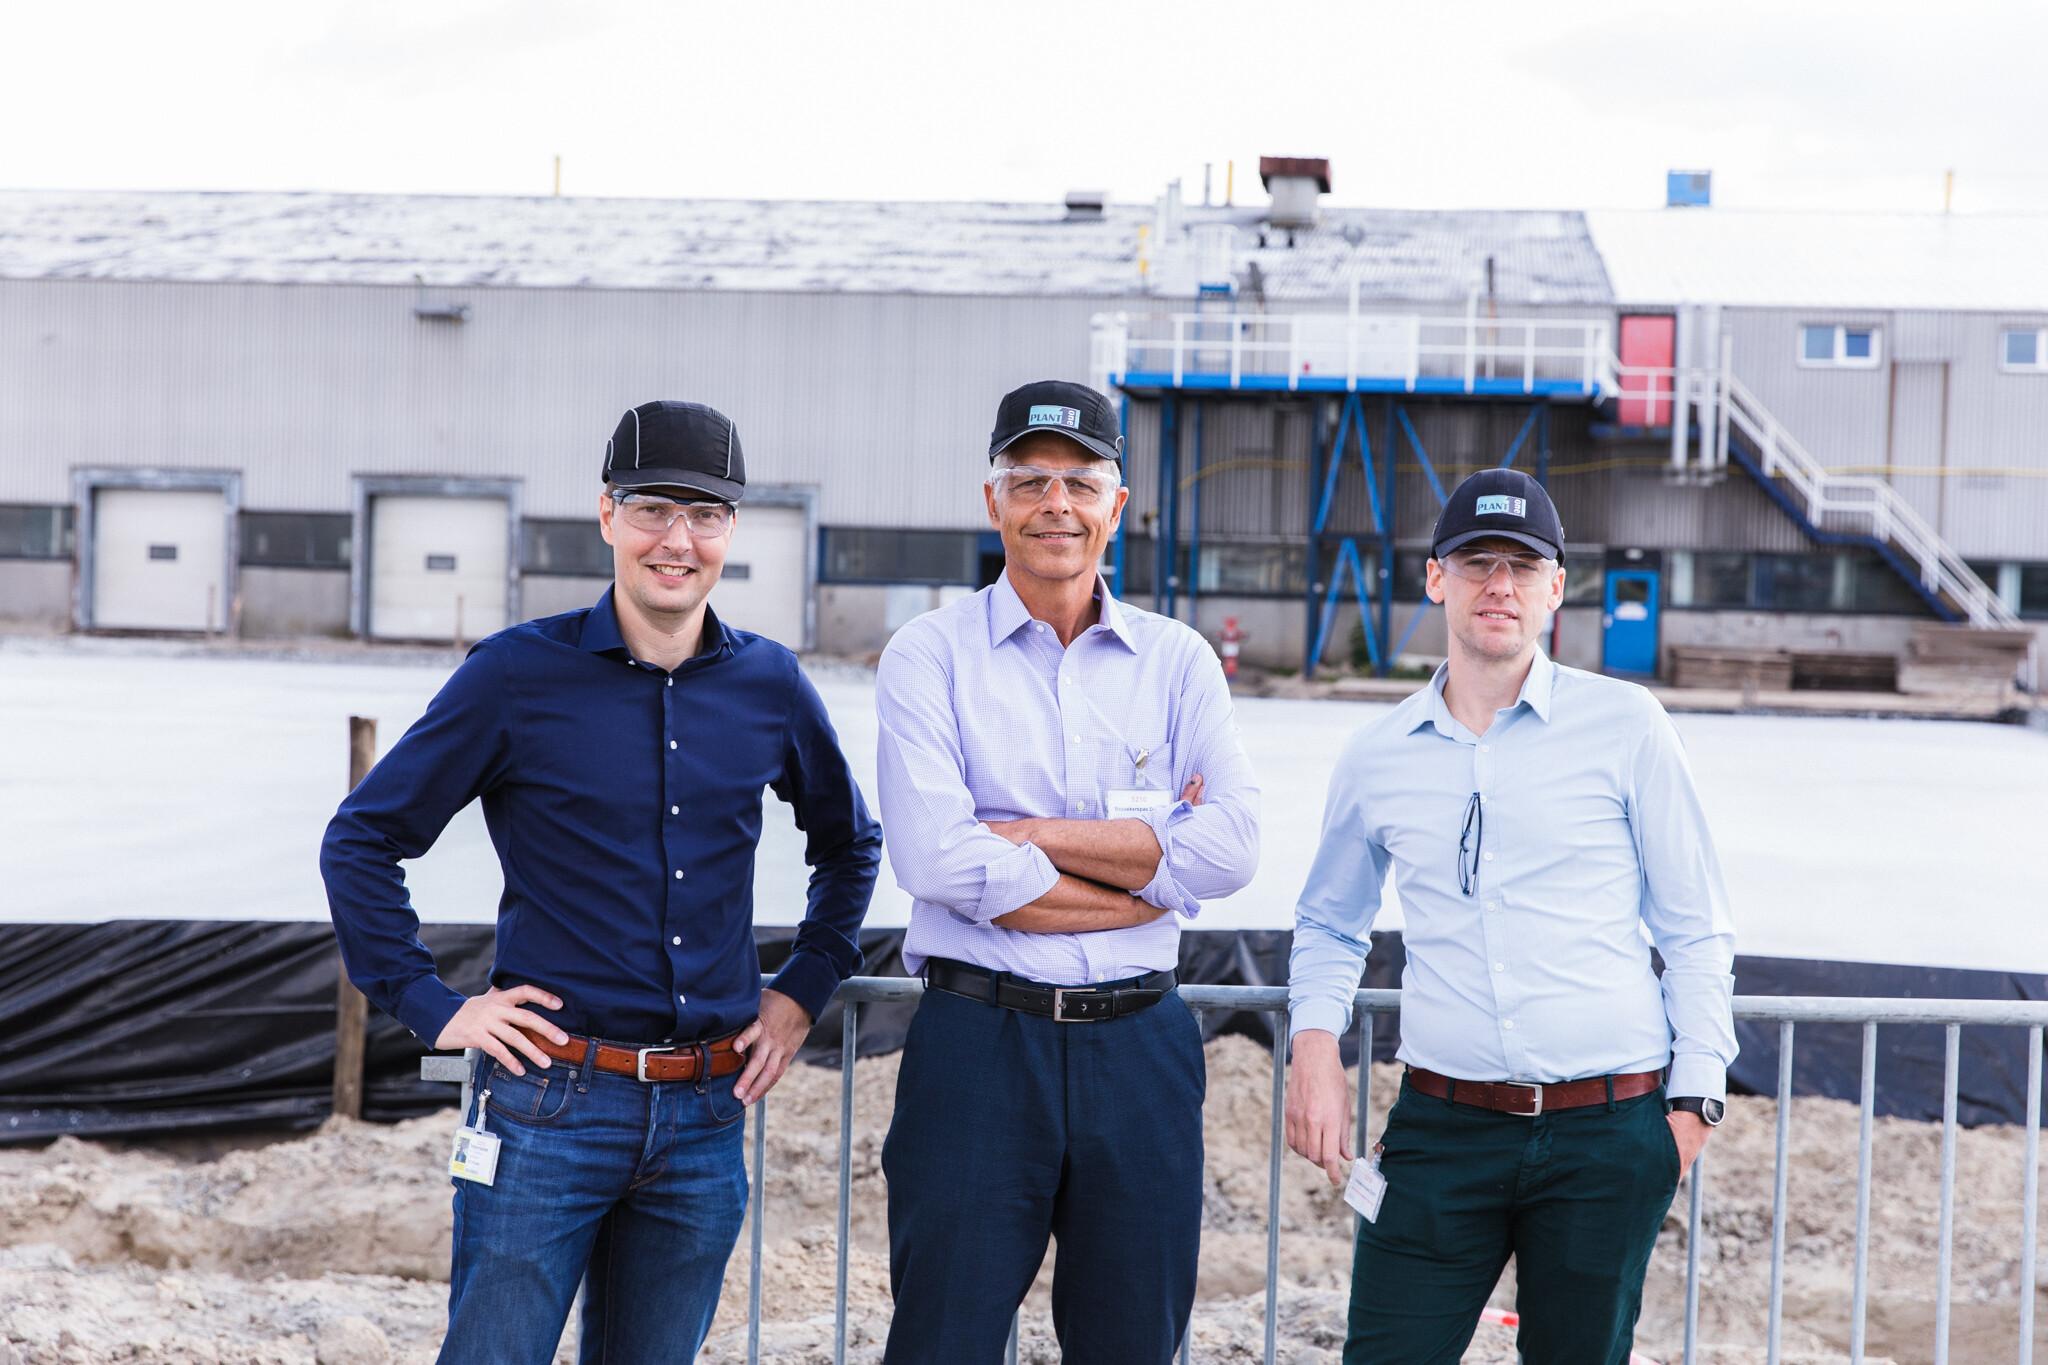 Sander, Michiel & Joeri